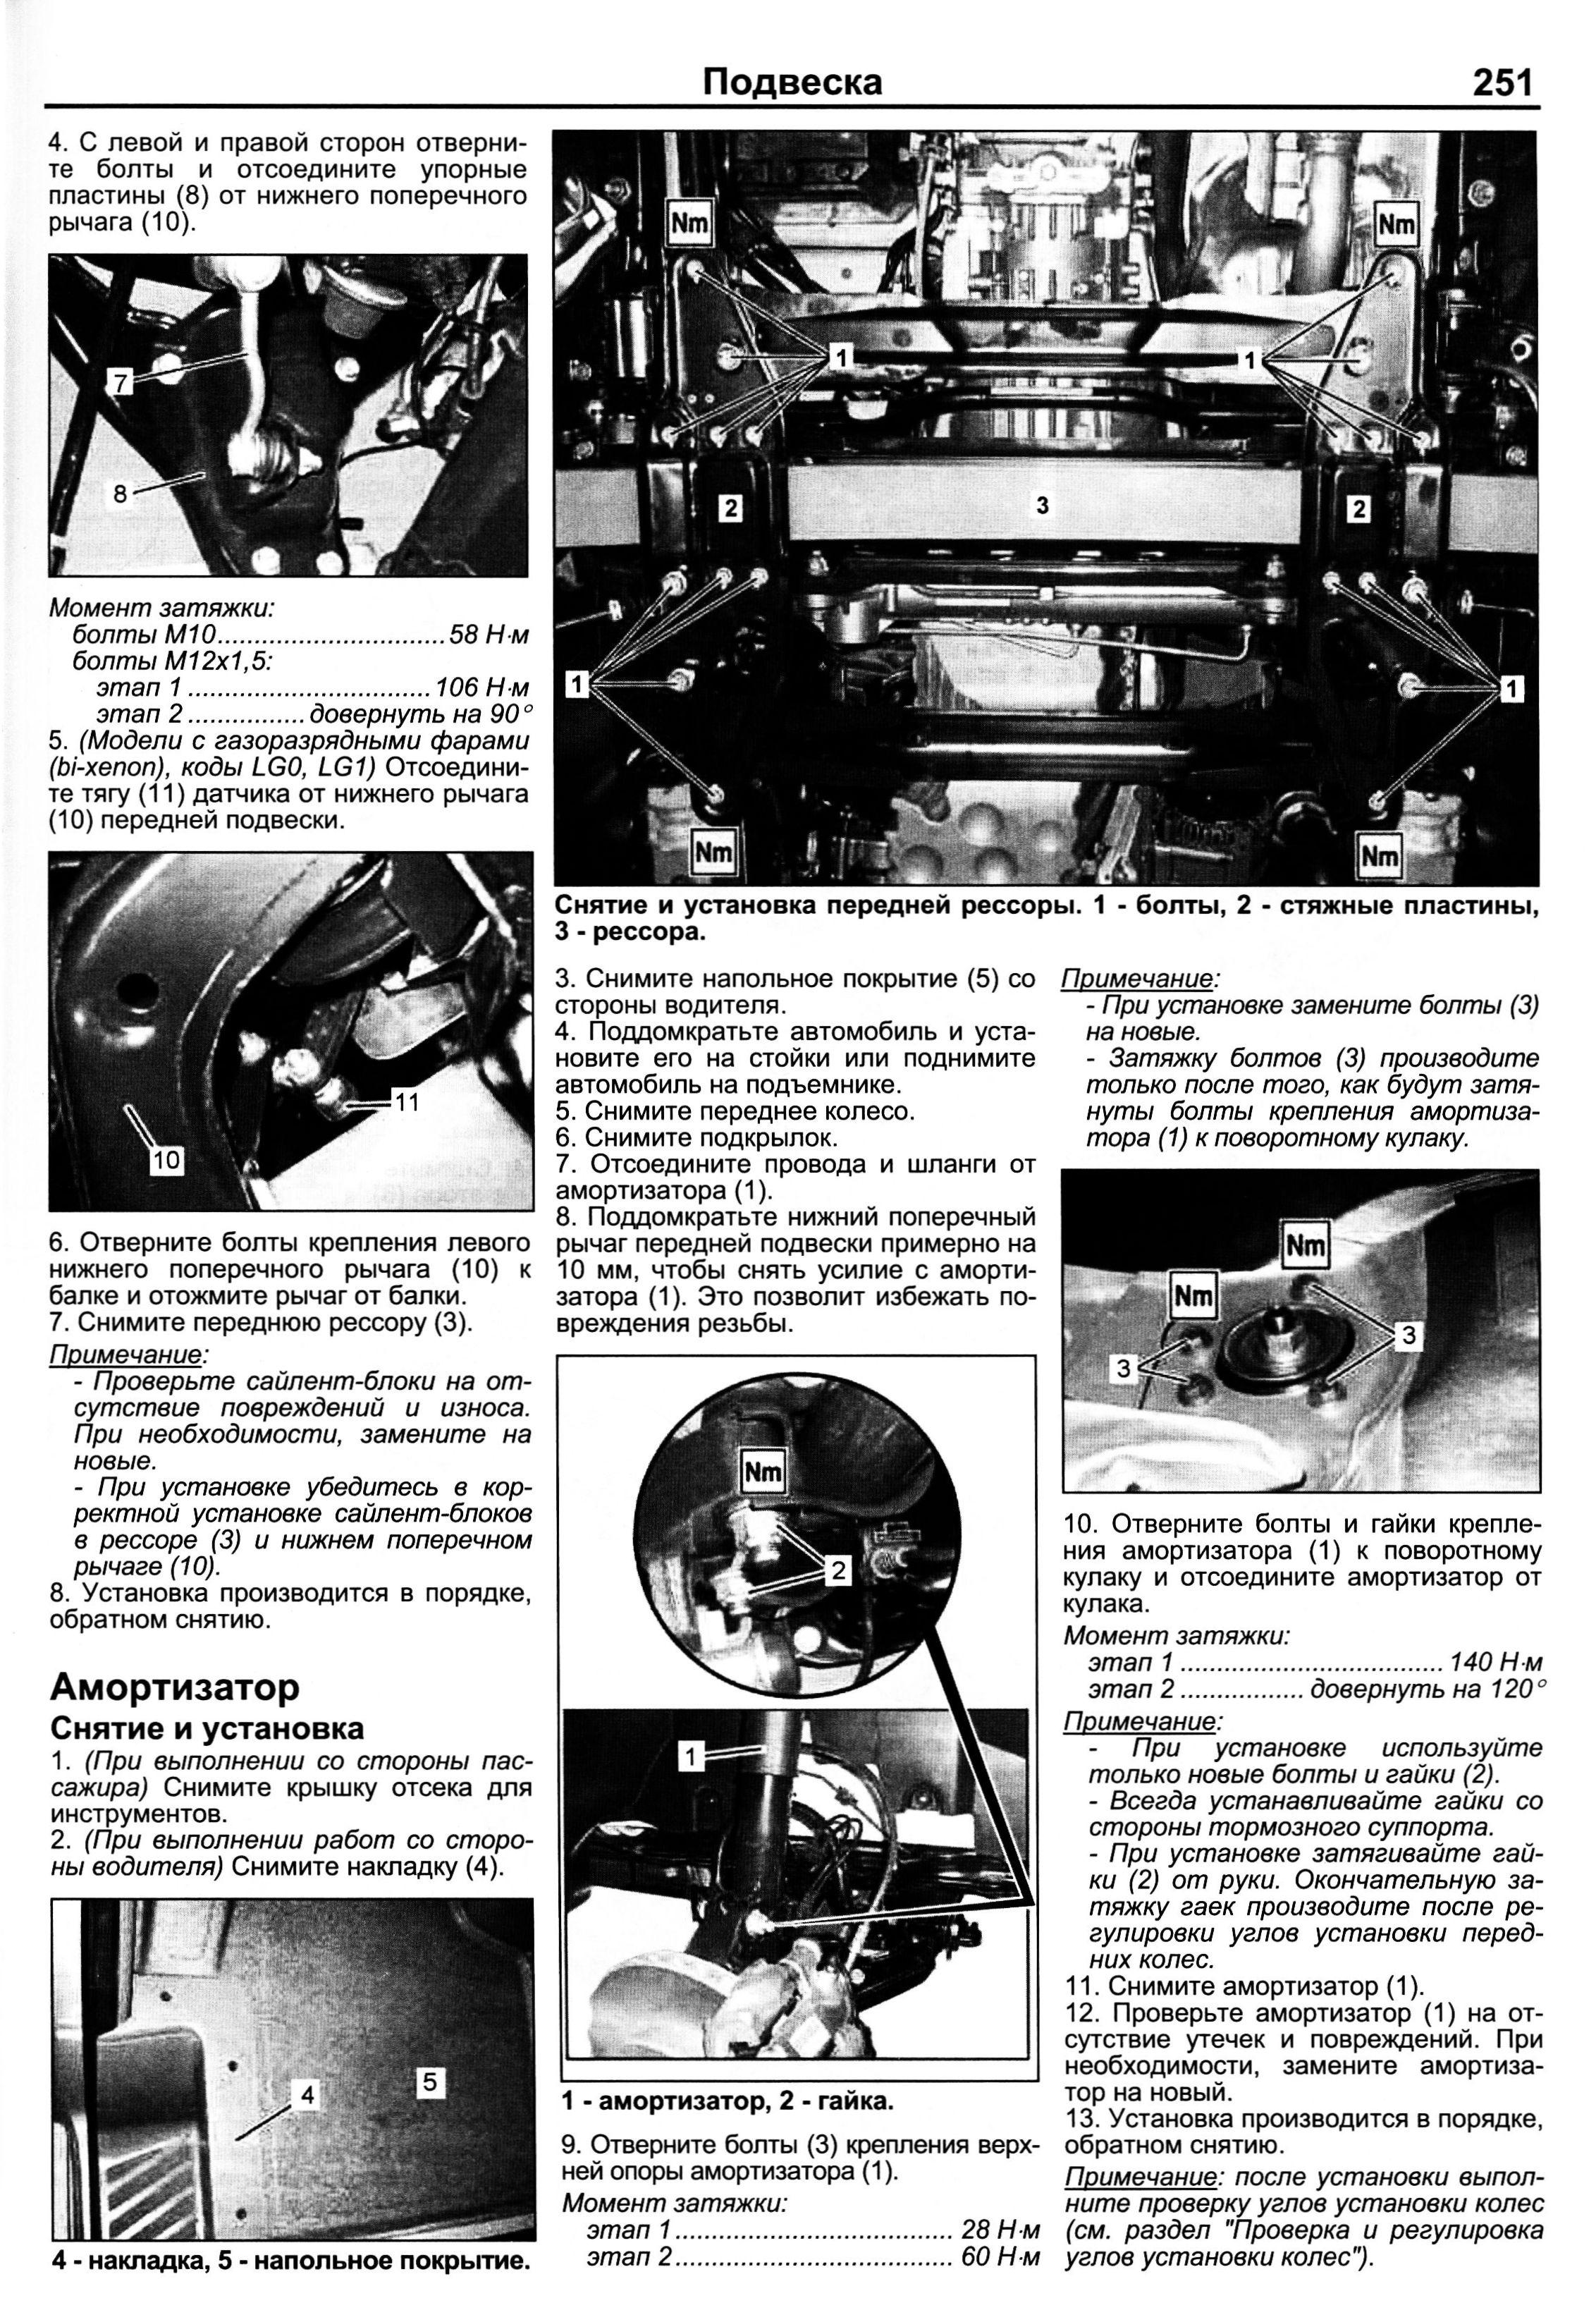 руководство по эксплуатации мерседес спринтер 906